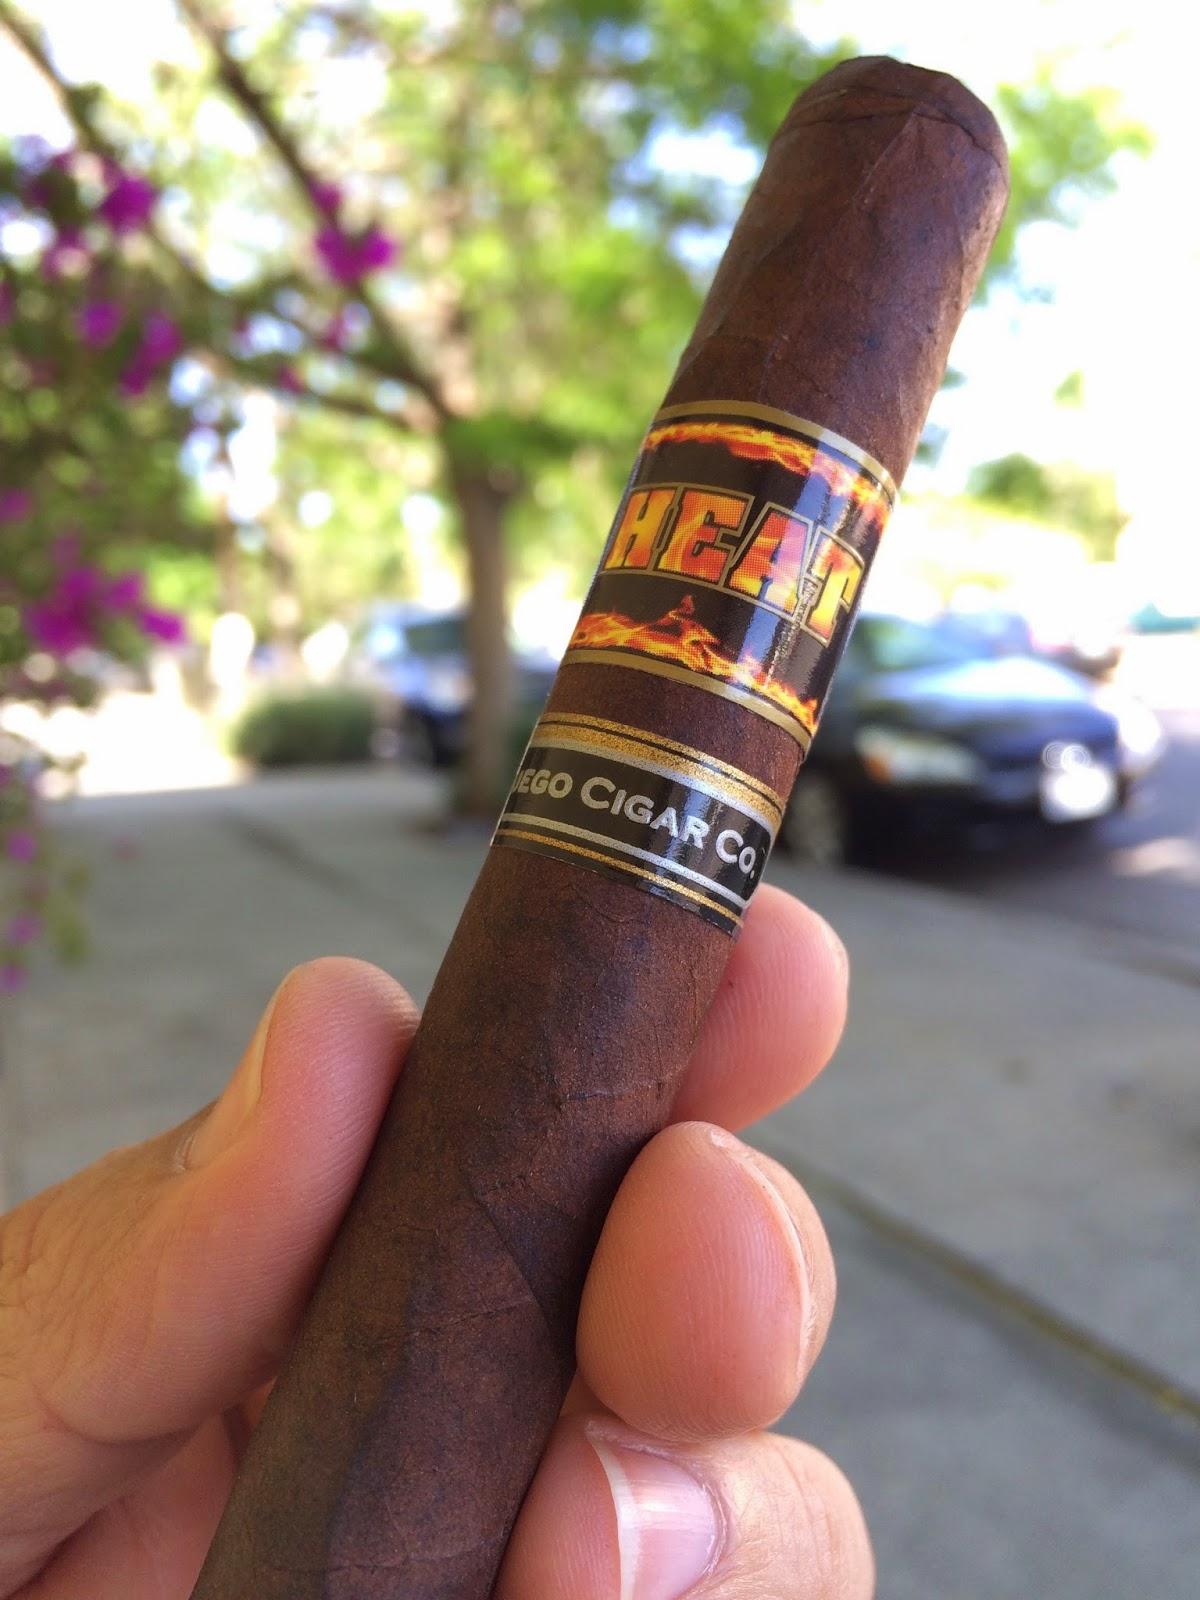 J. Fuego Heat cigar 1